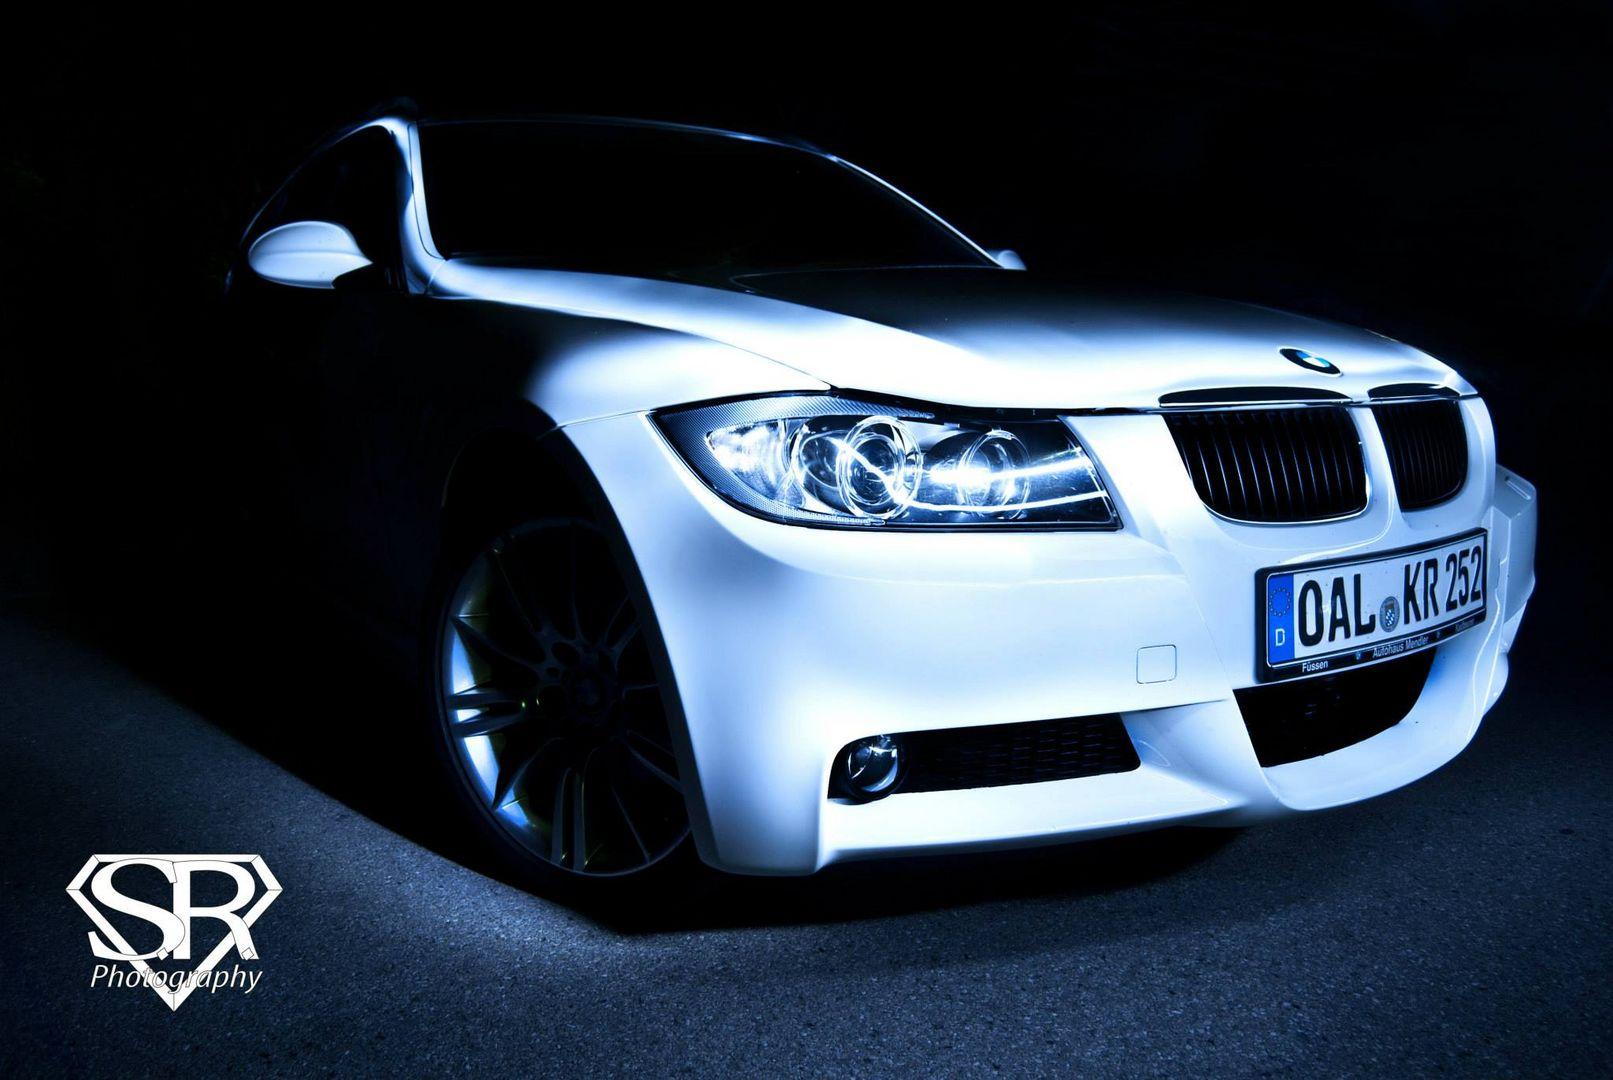 Lightart S.R. Car Photography 3er BMW Touring